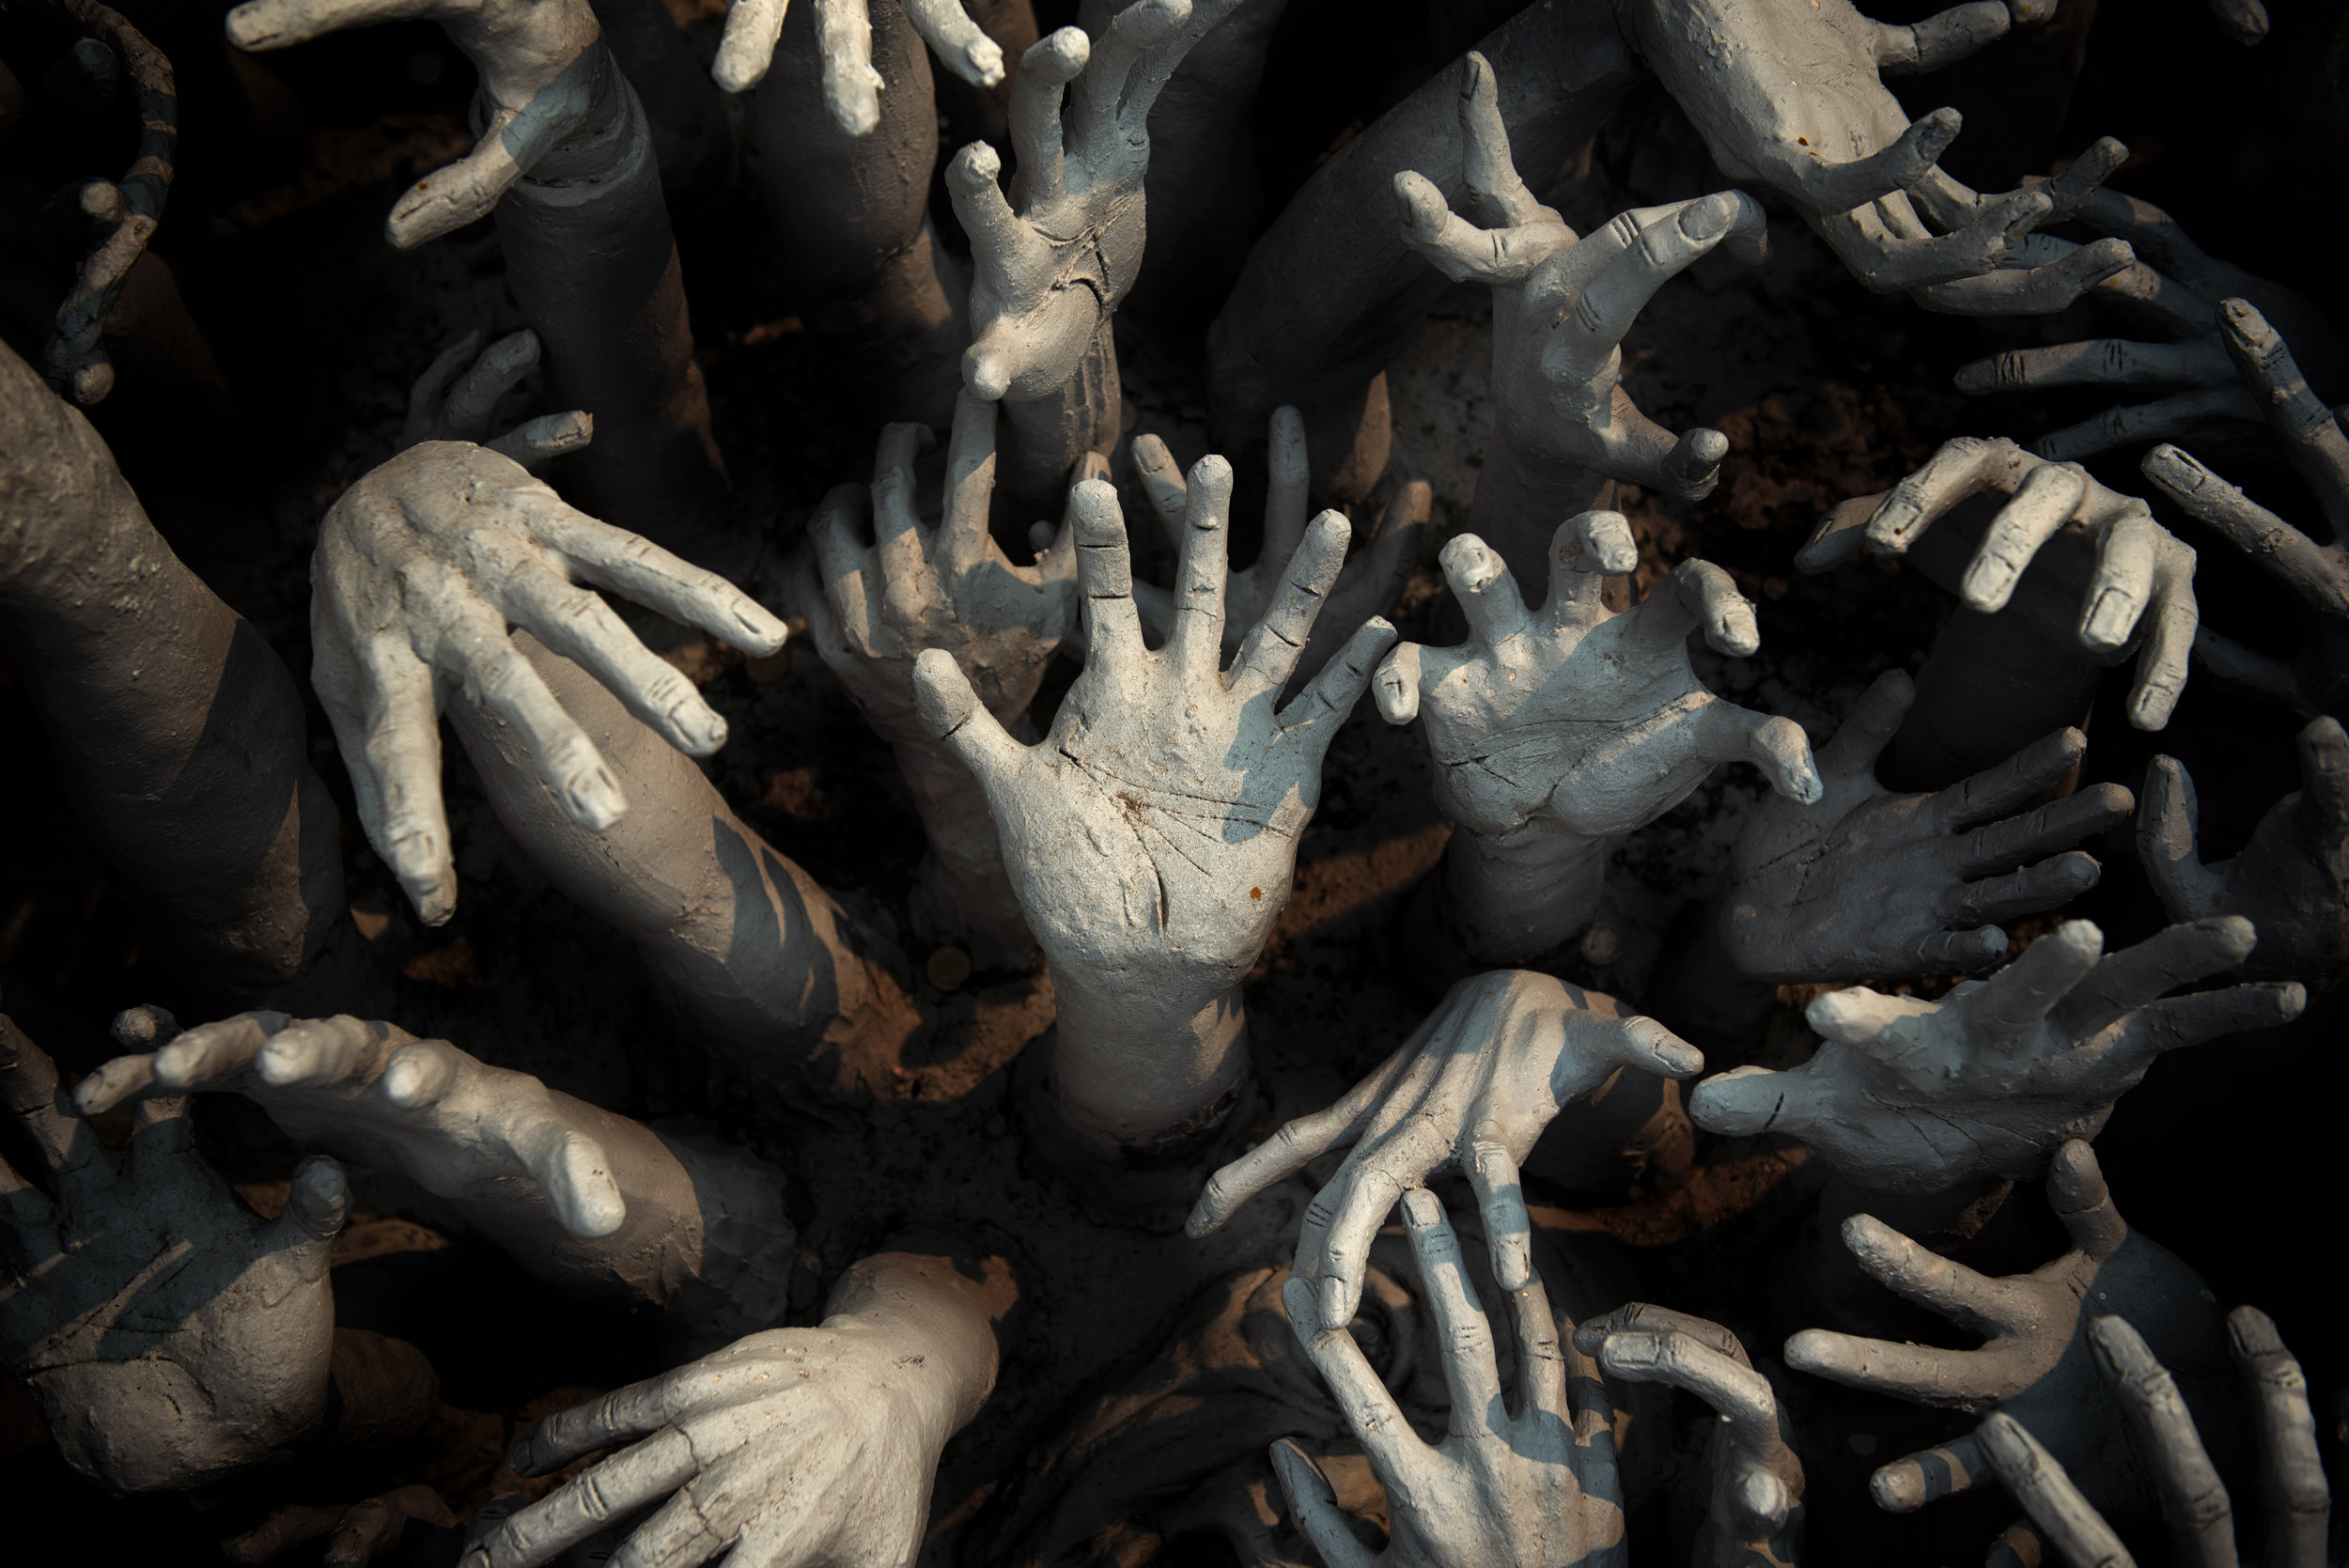 Zombie hands_ss_421682224.jpg